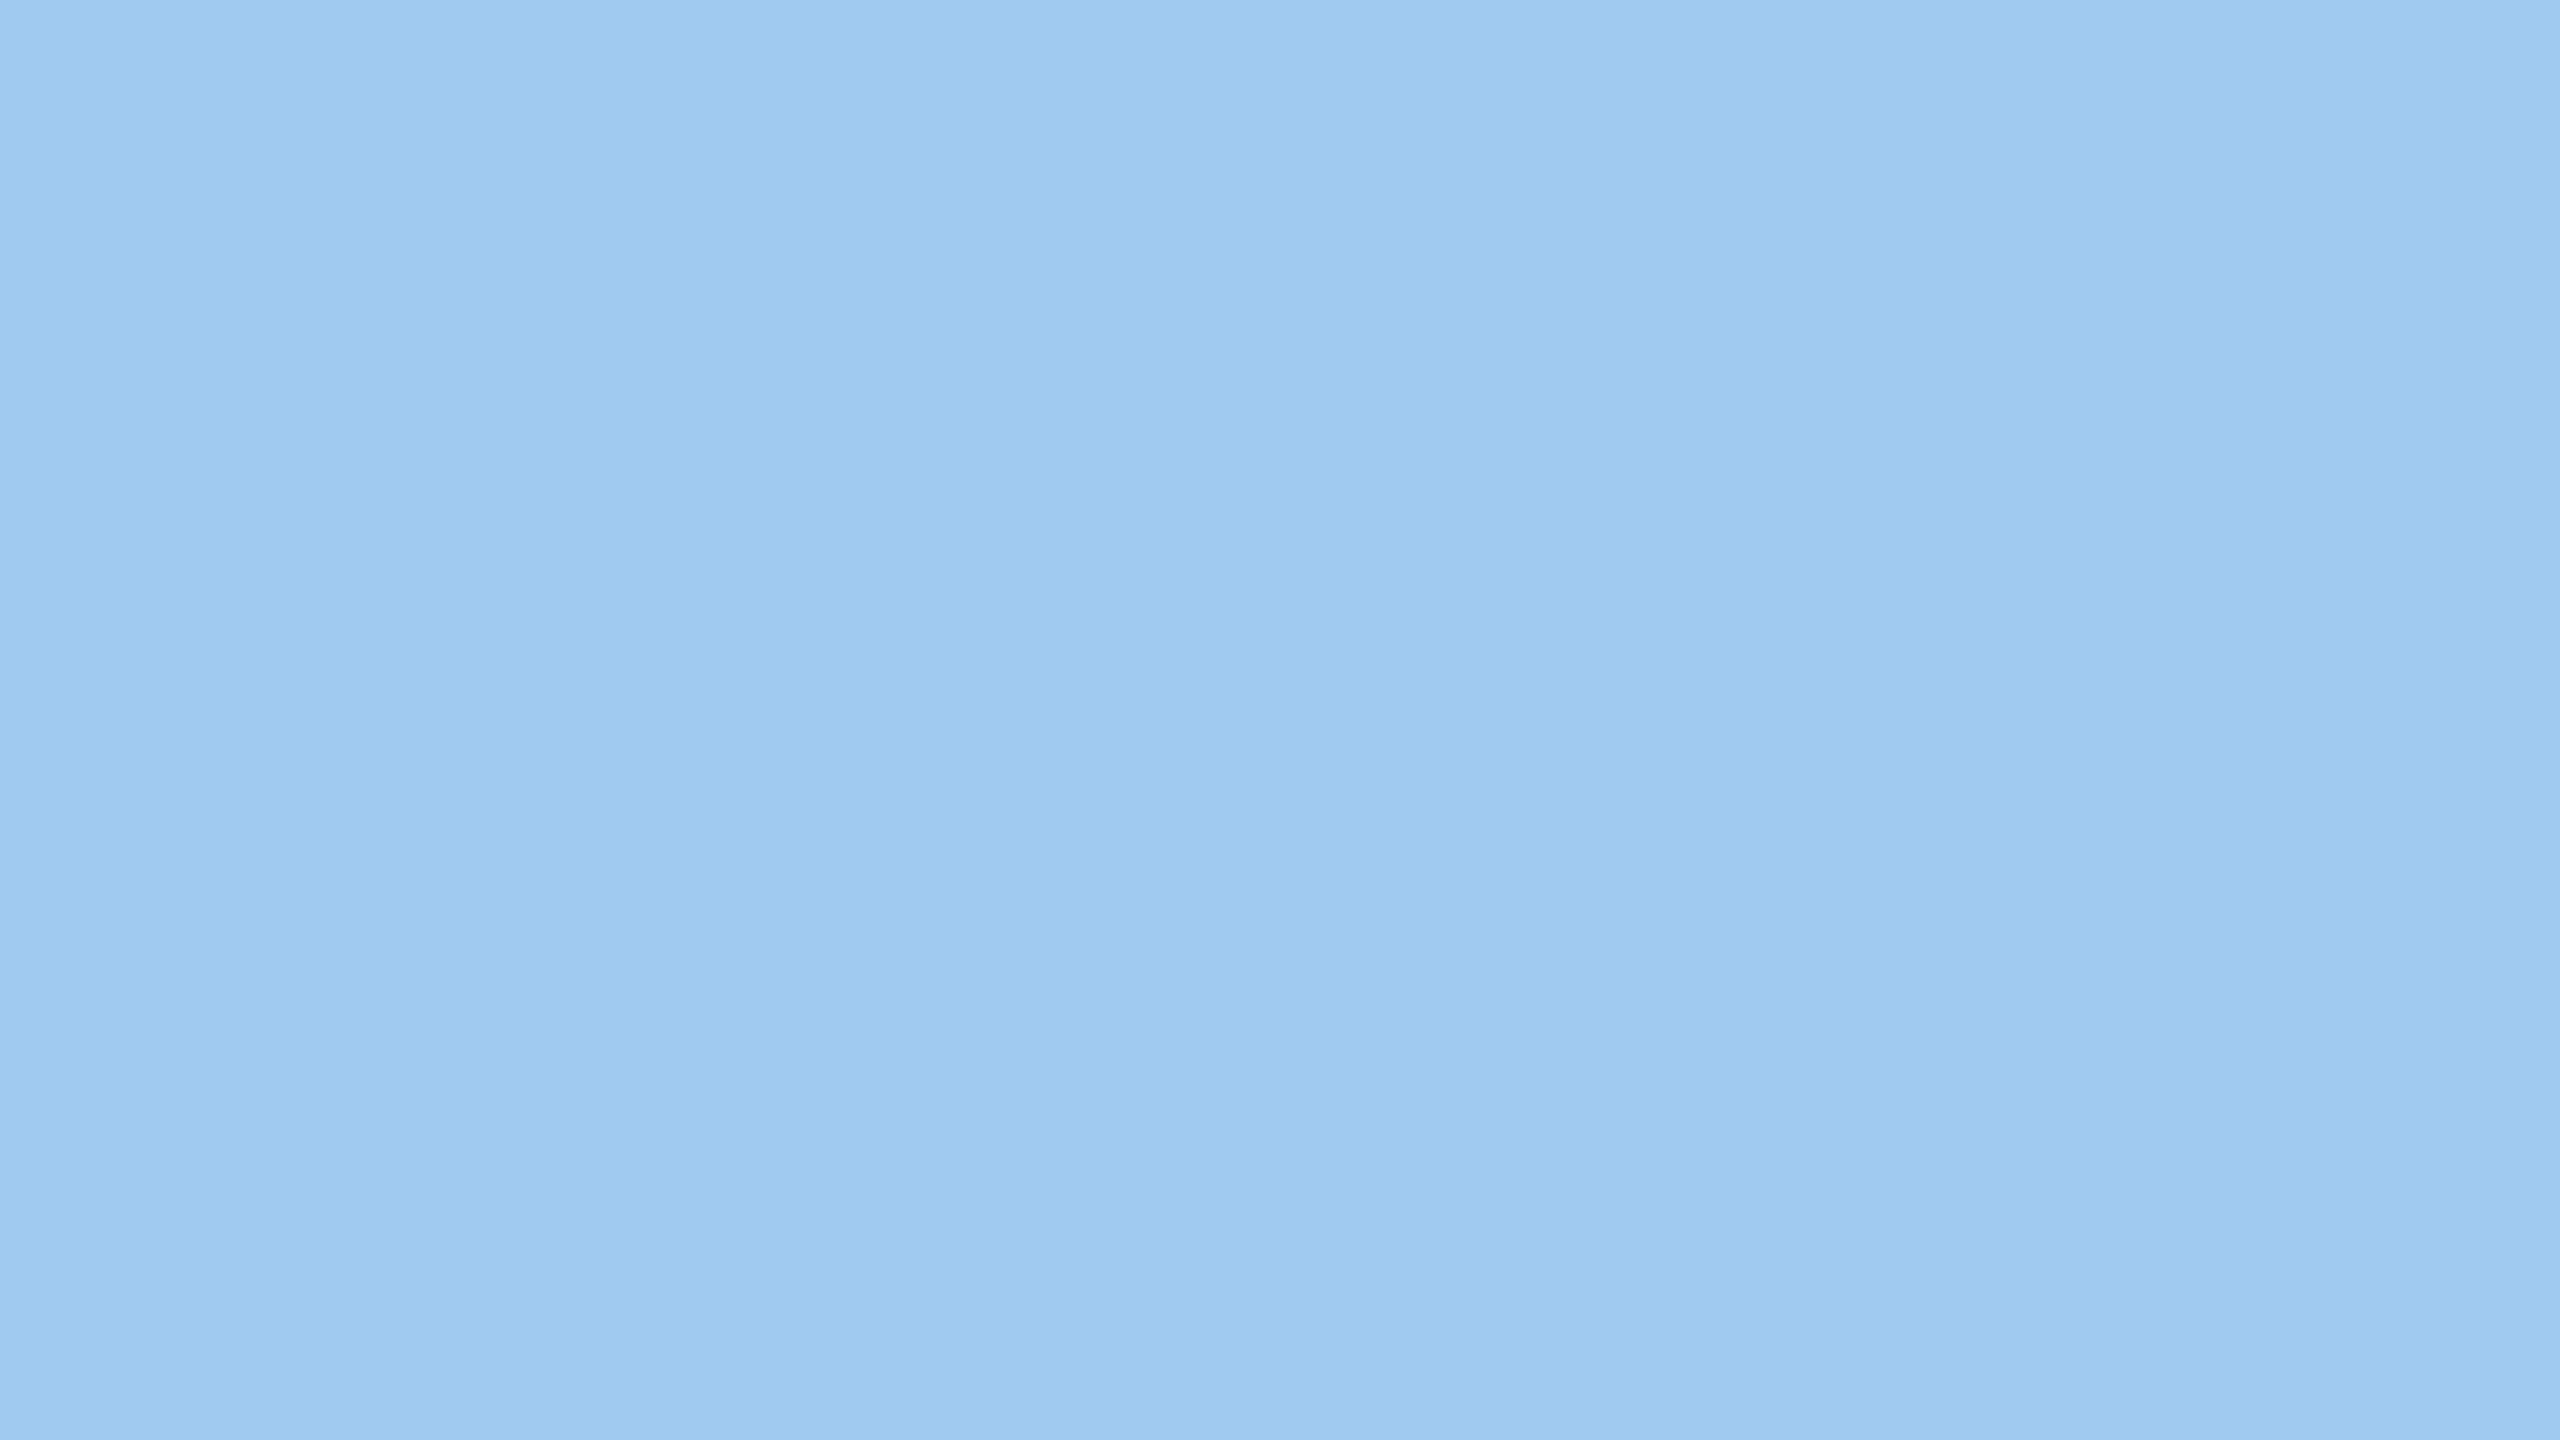 75+ Baby Blue Wallpapers on WallpaperSafari